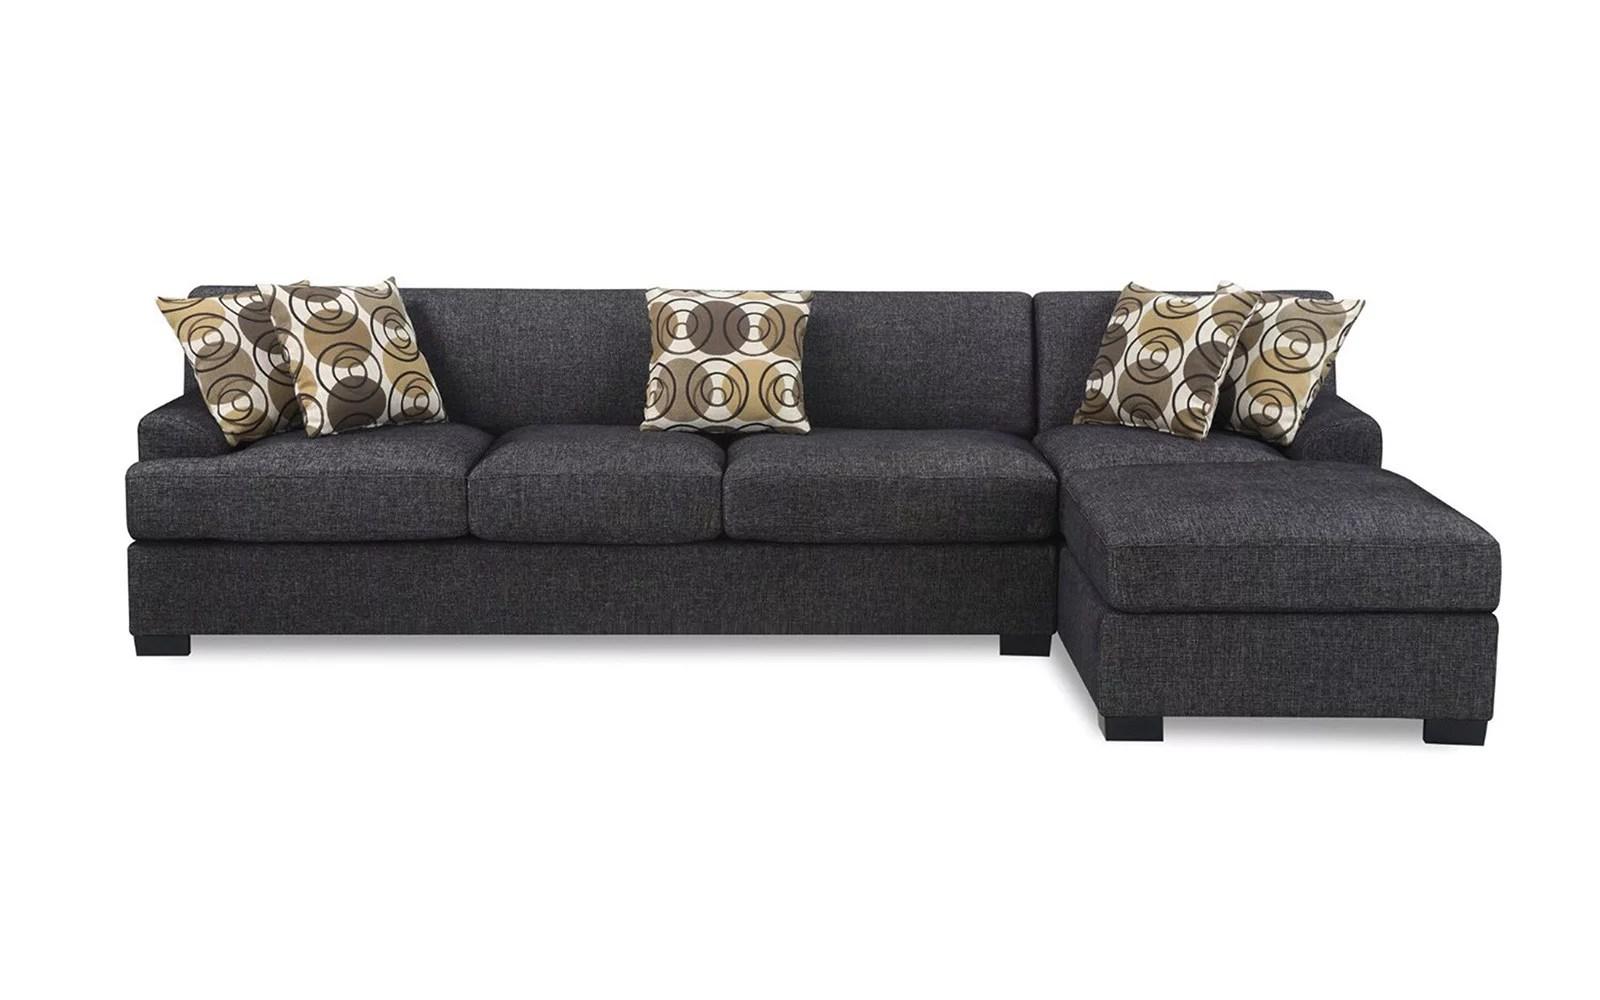 natalia leather and chenille sofa modern chaise black home the honoroak